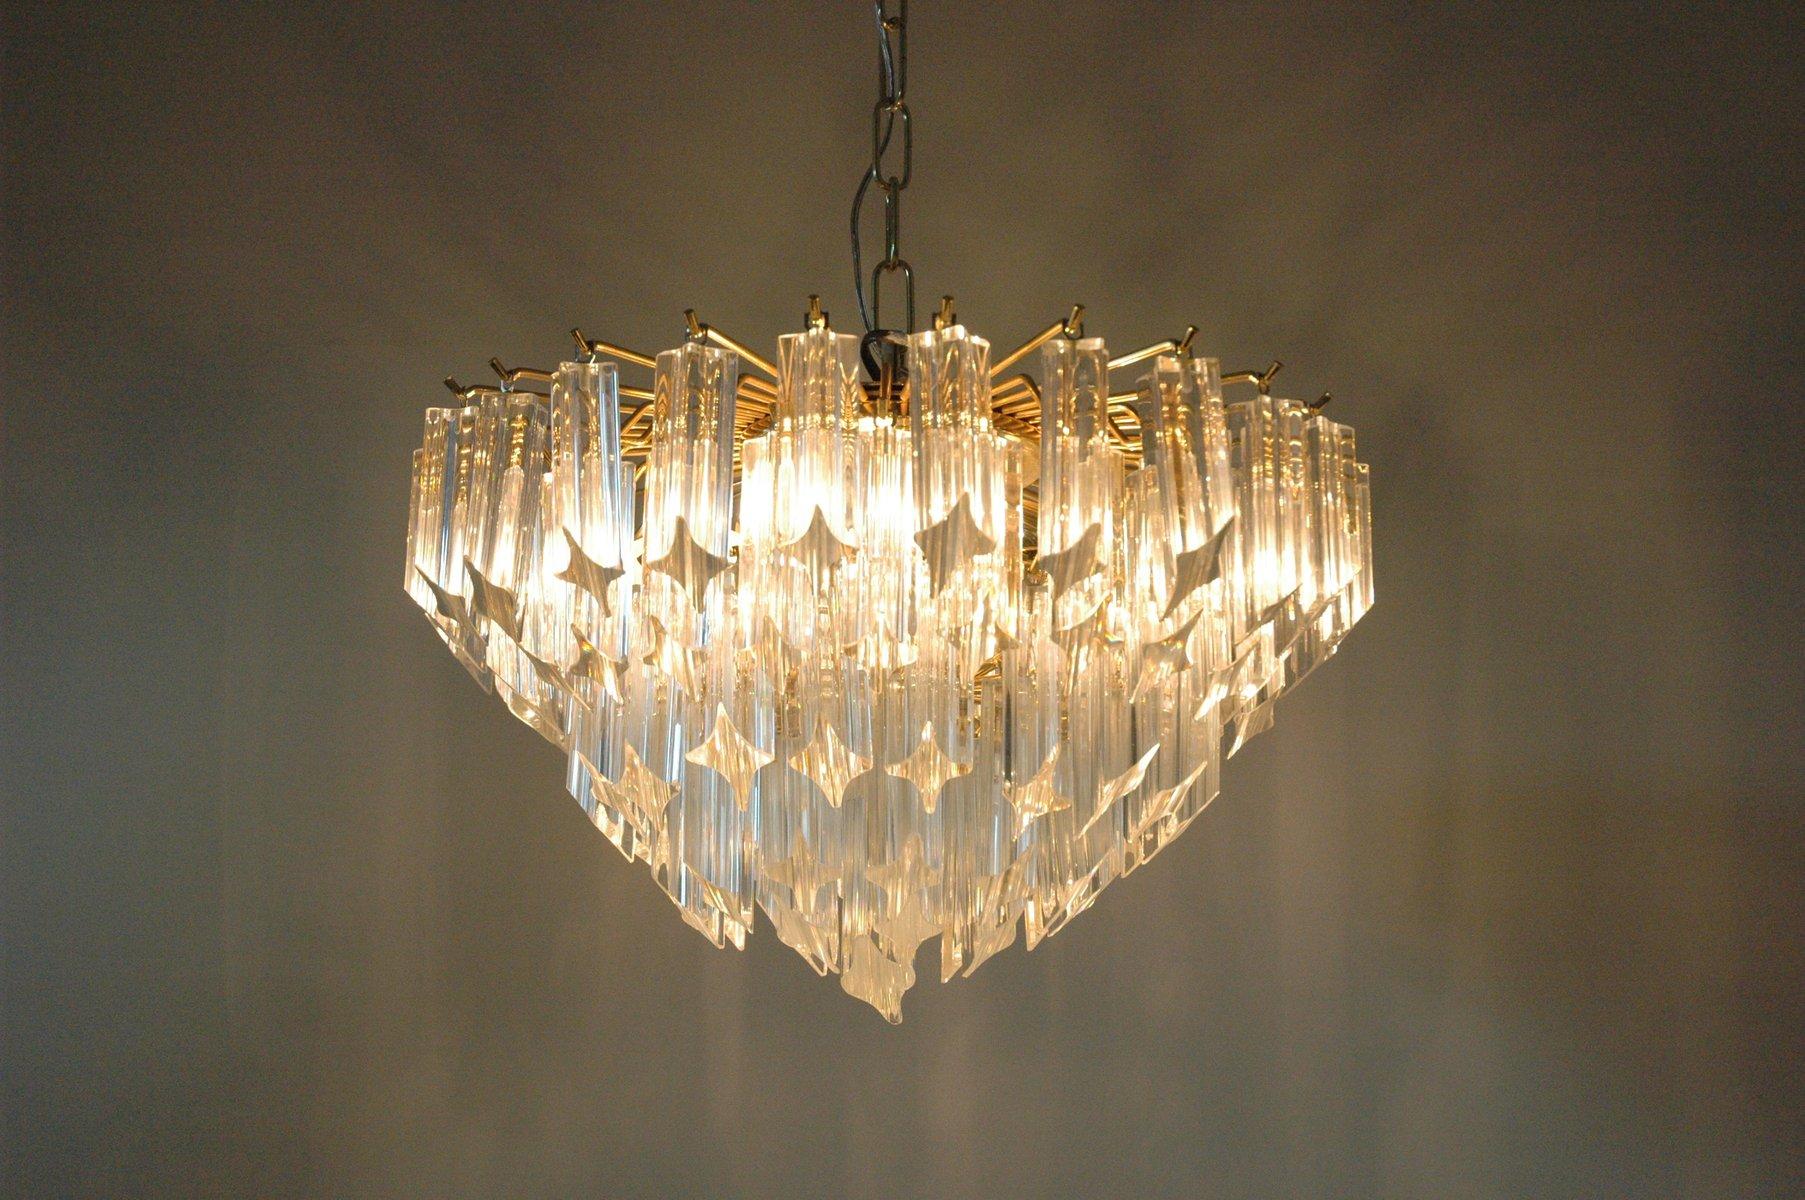 chandelier quadrilobi vintage en verre de murano par paolo venini for novaresi en vente sur pamono. Black Bedroom Furniture Sets. Home Design Ideas